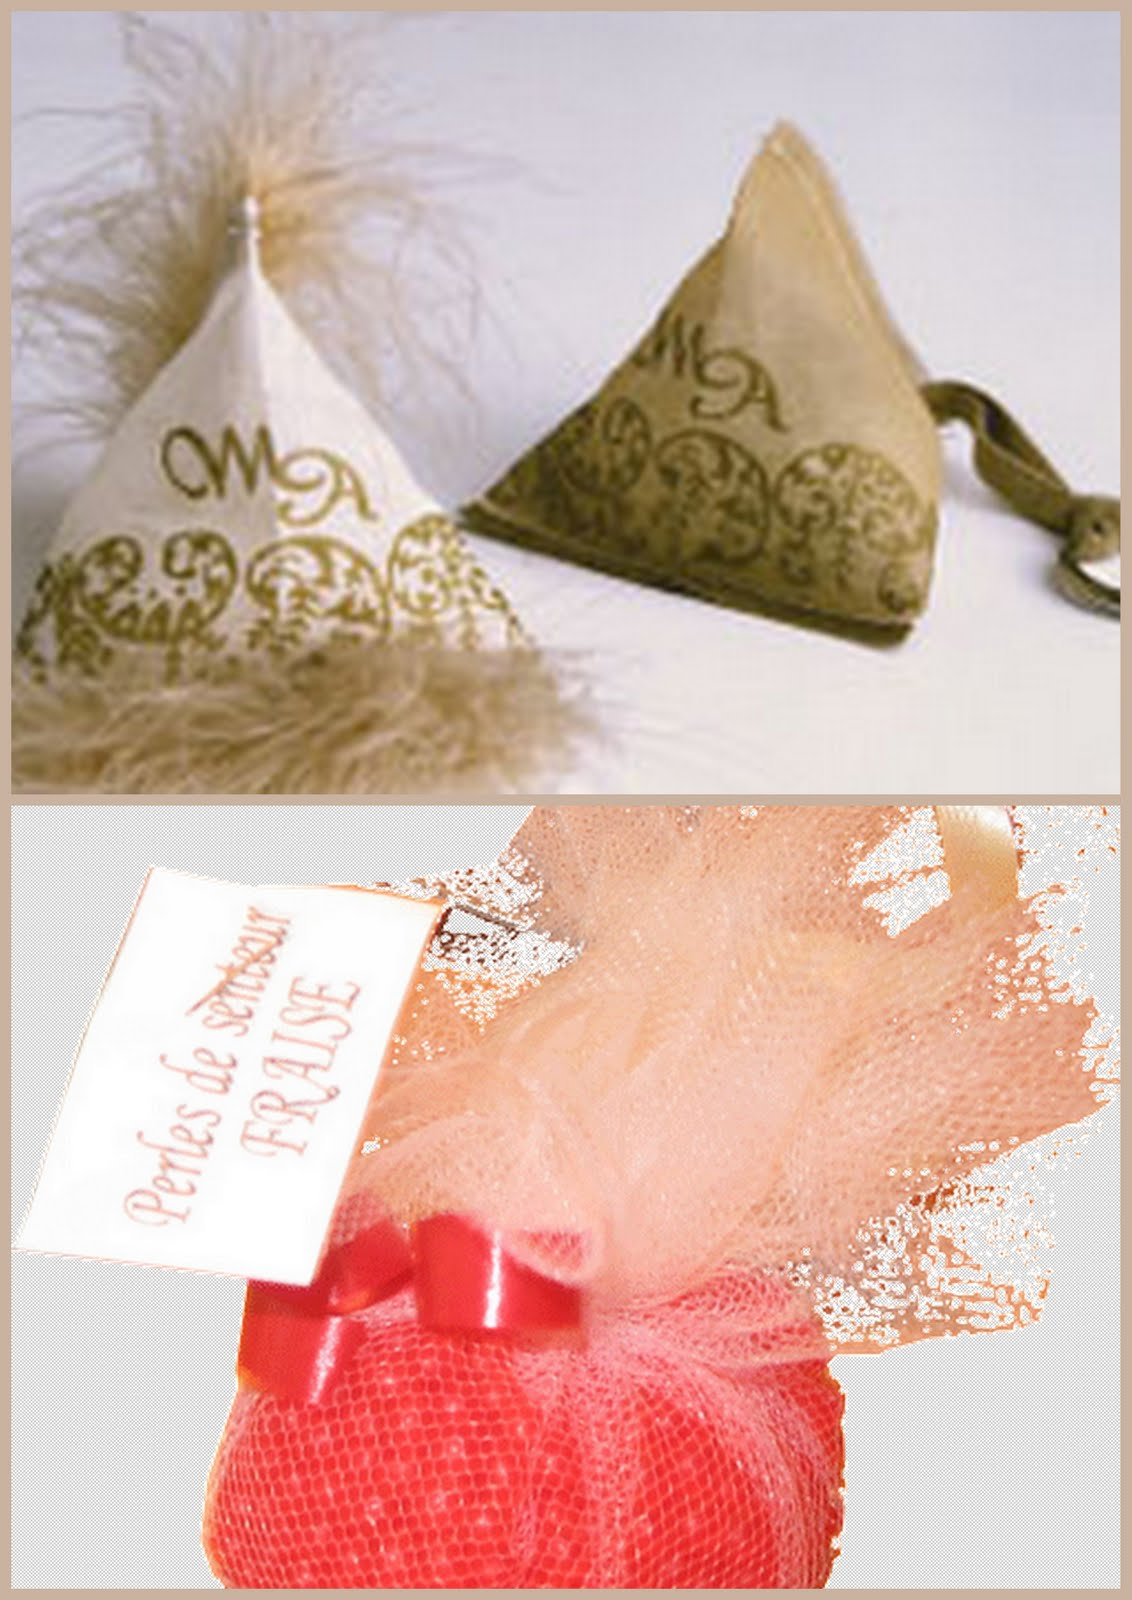 mariage id e cadeaux invit s et caetara. Black Bedroom Furniture Sets. Home Design Ideas